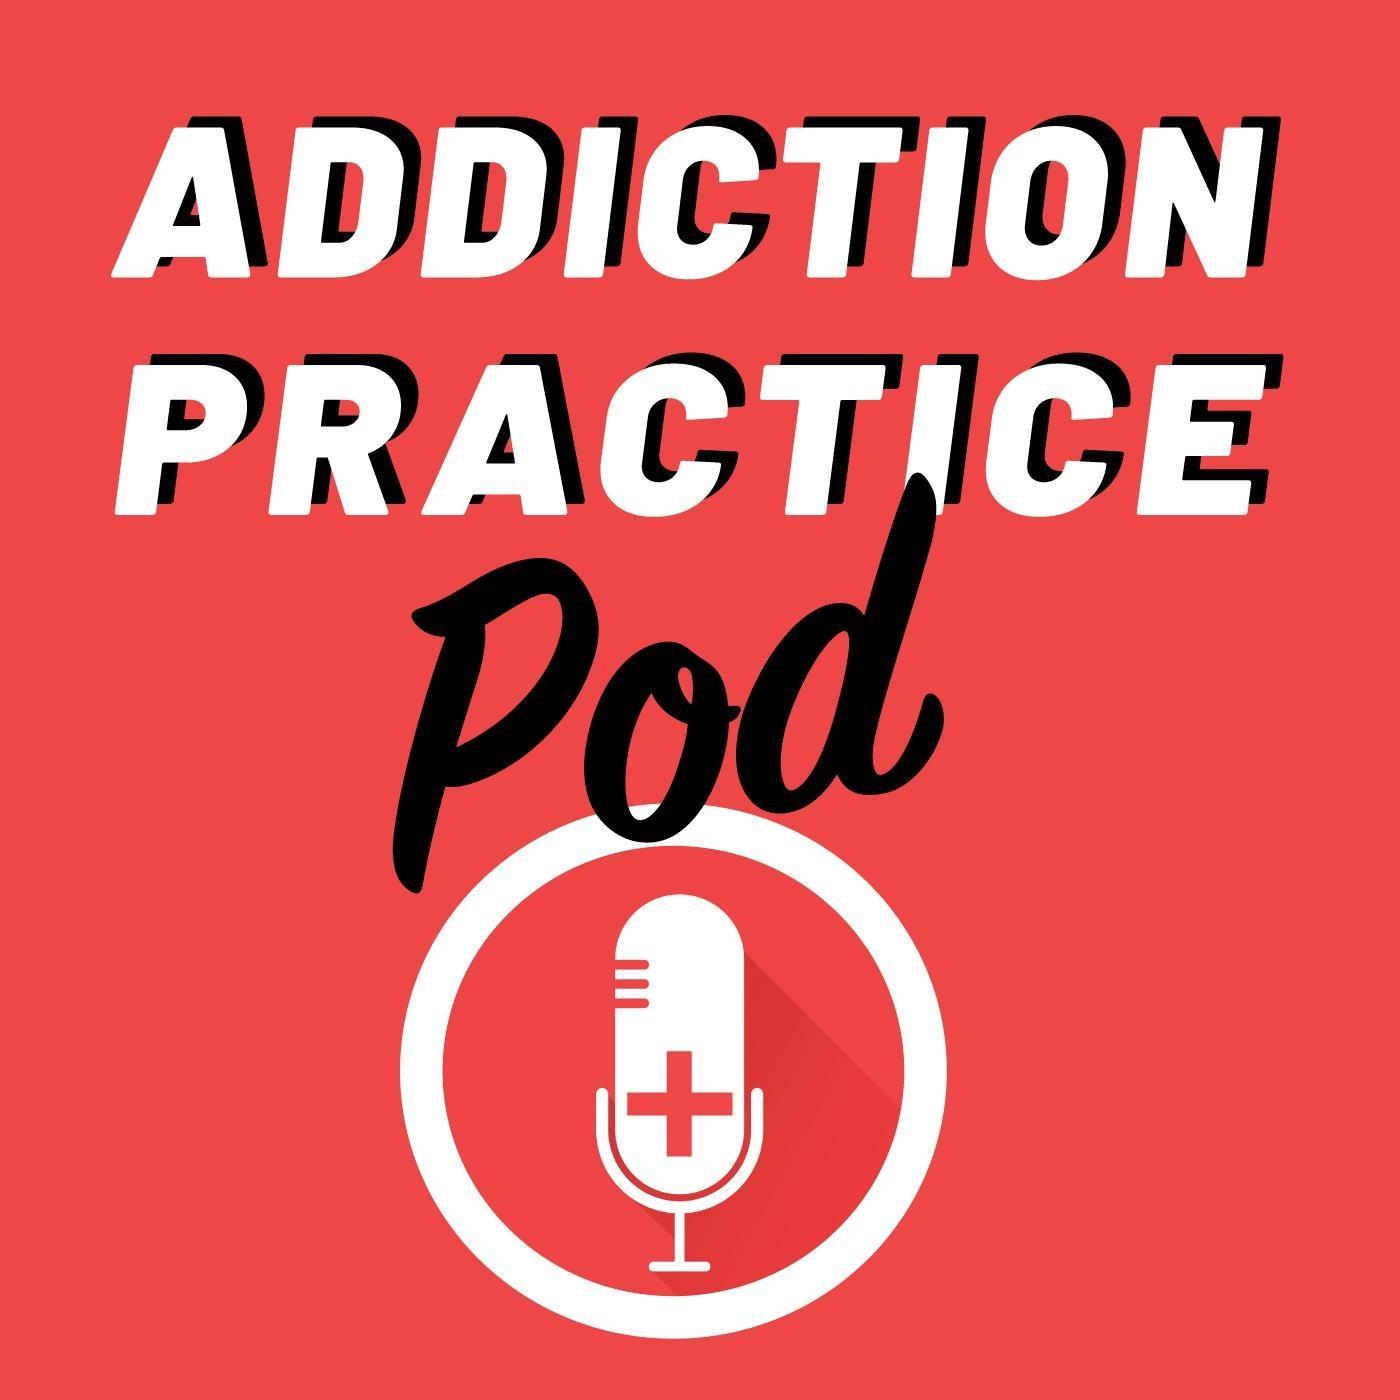 Addiction Practice Pod